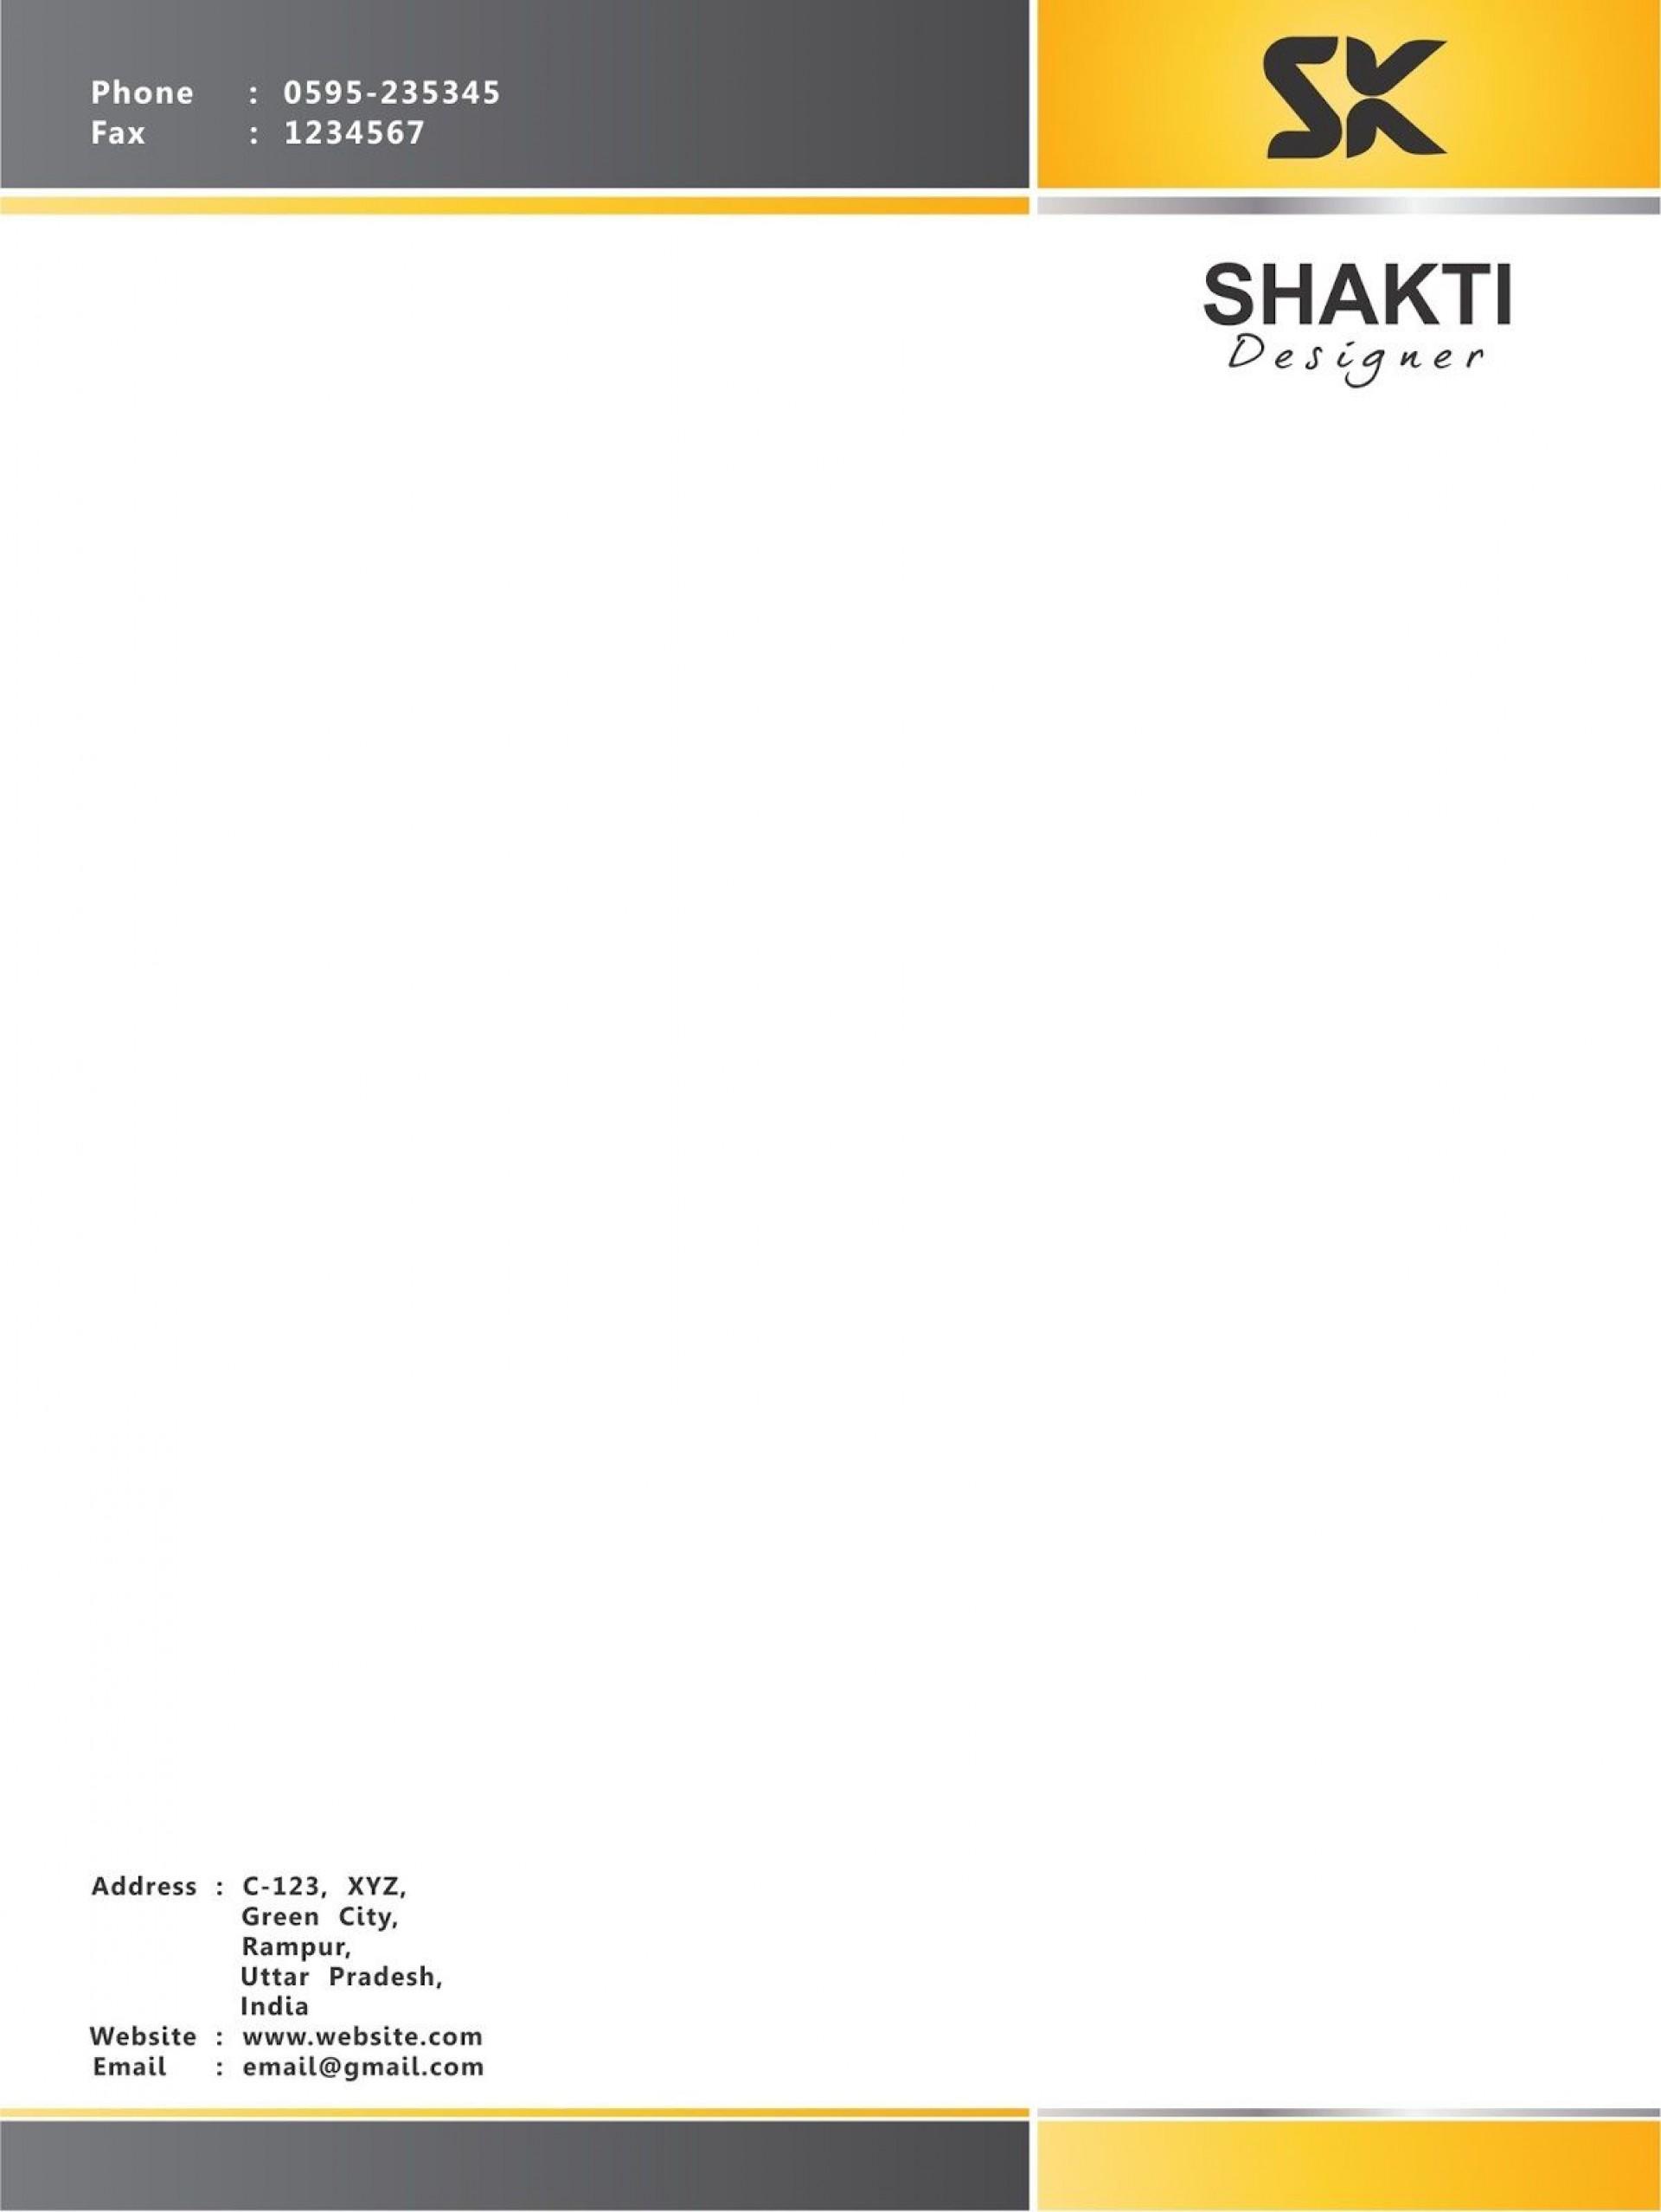 009 Impressive Free Letterhead Template Download Design  Word Psd Sample1920